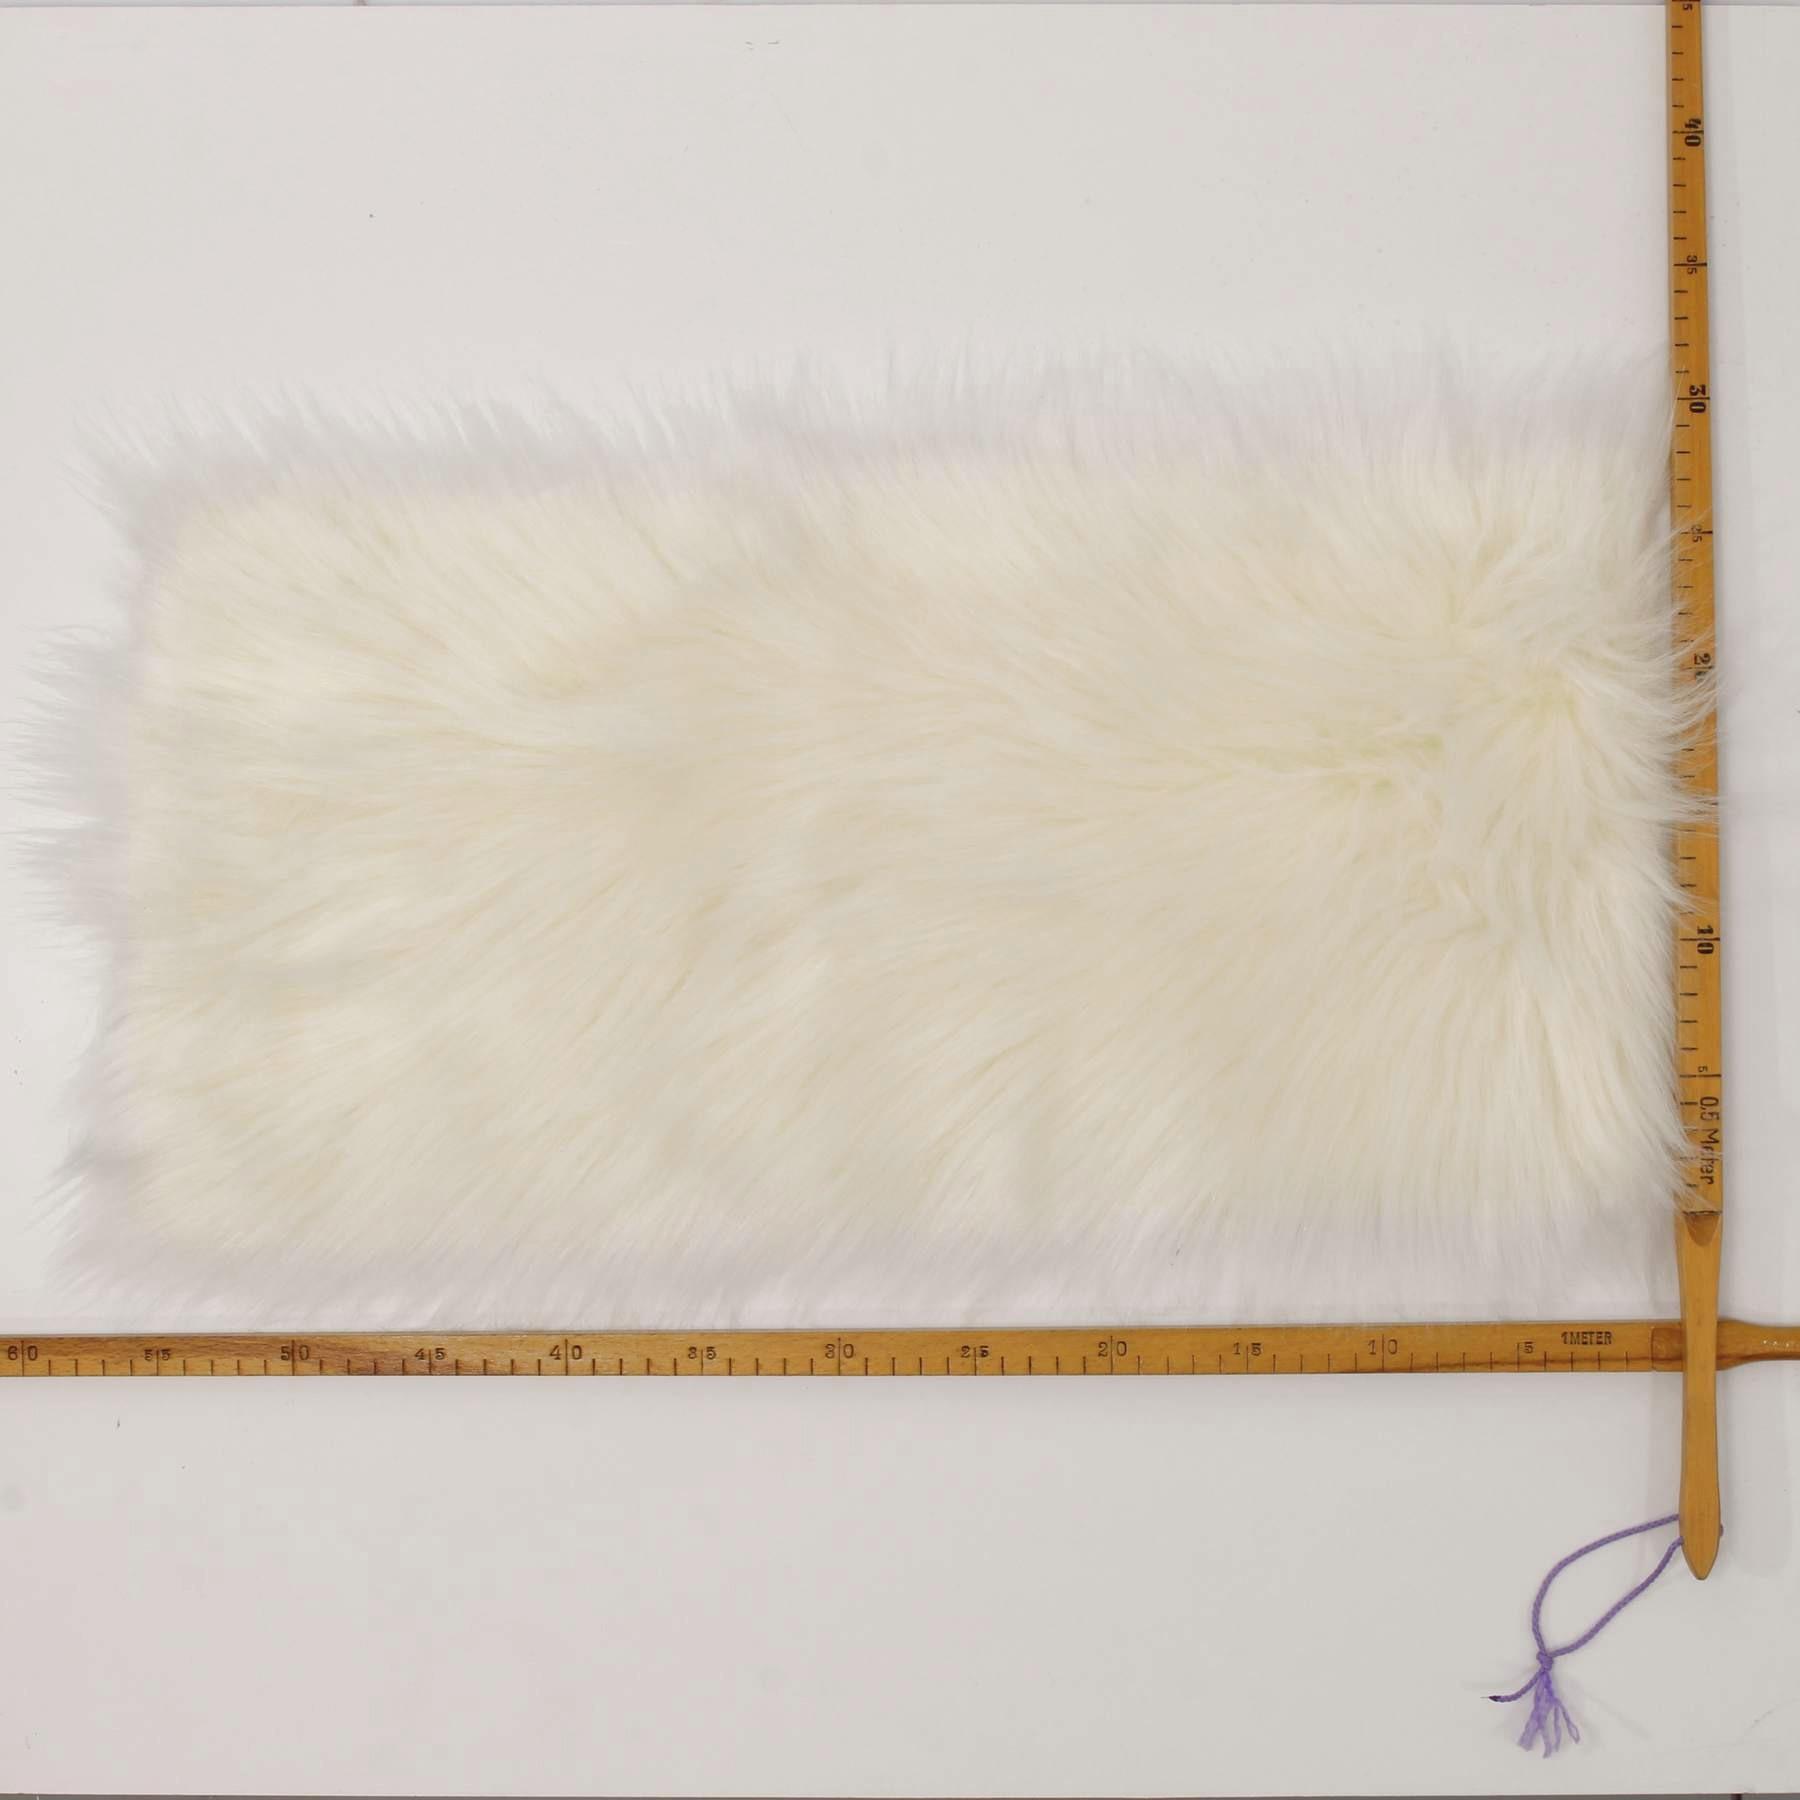 Trozo de tela pelo largo felpa blanco crema psíquico fell imitacion de peluche de tela 20 x 50cm